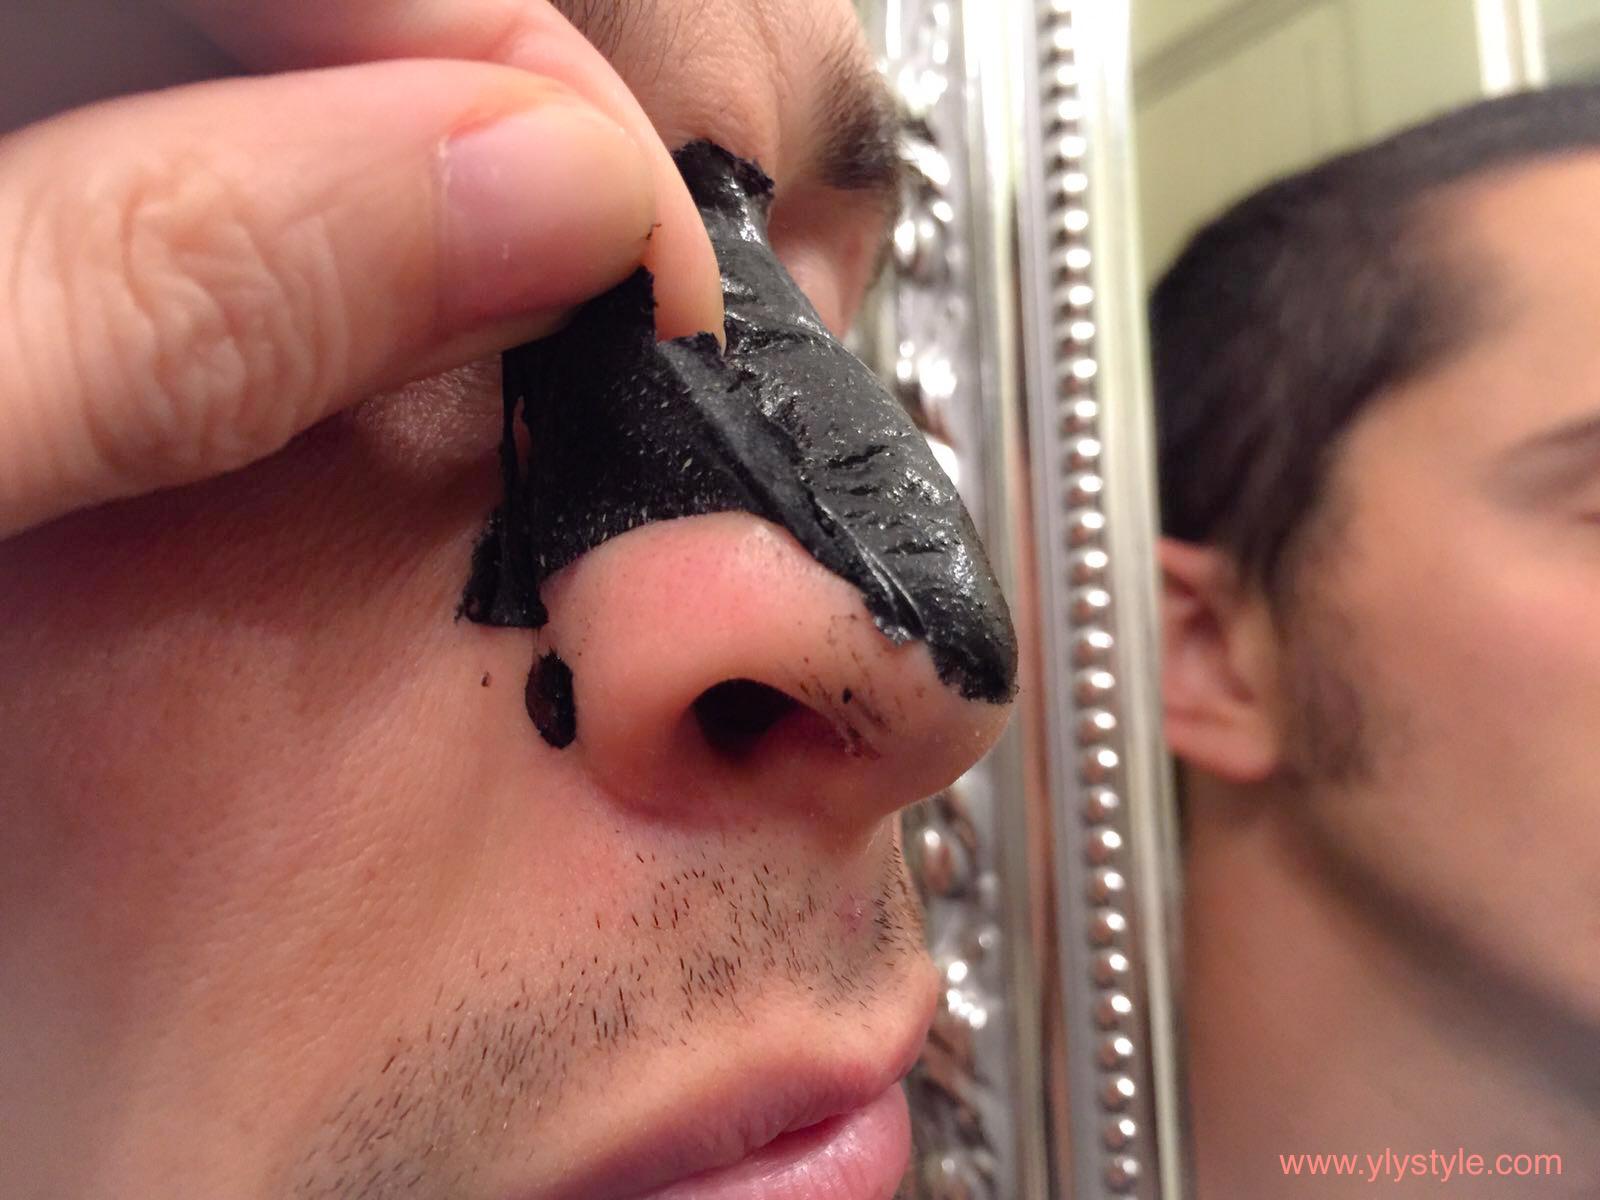 Maschera da infiammazioni su un lievito di faccia